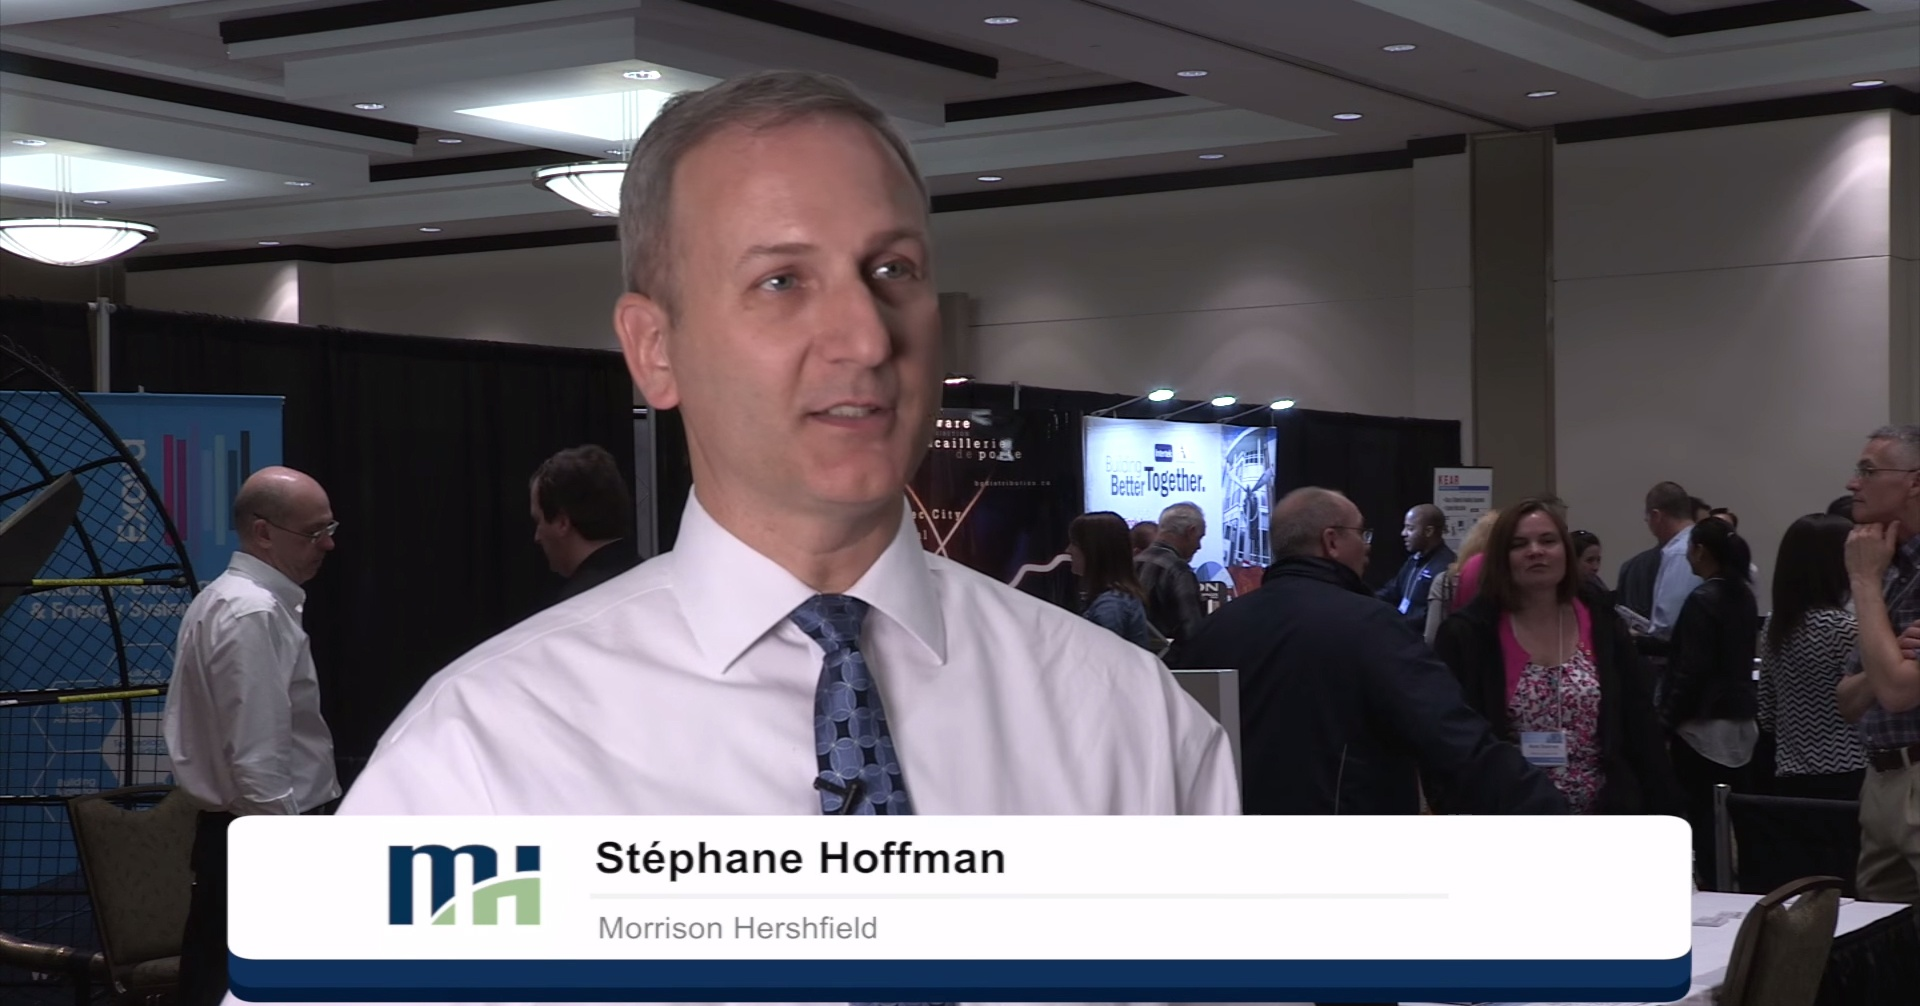 stephane-hoffman-feat-image.jpg